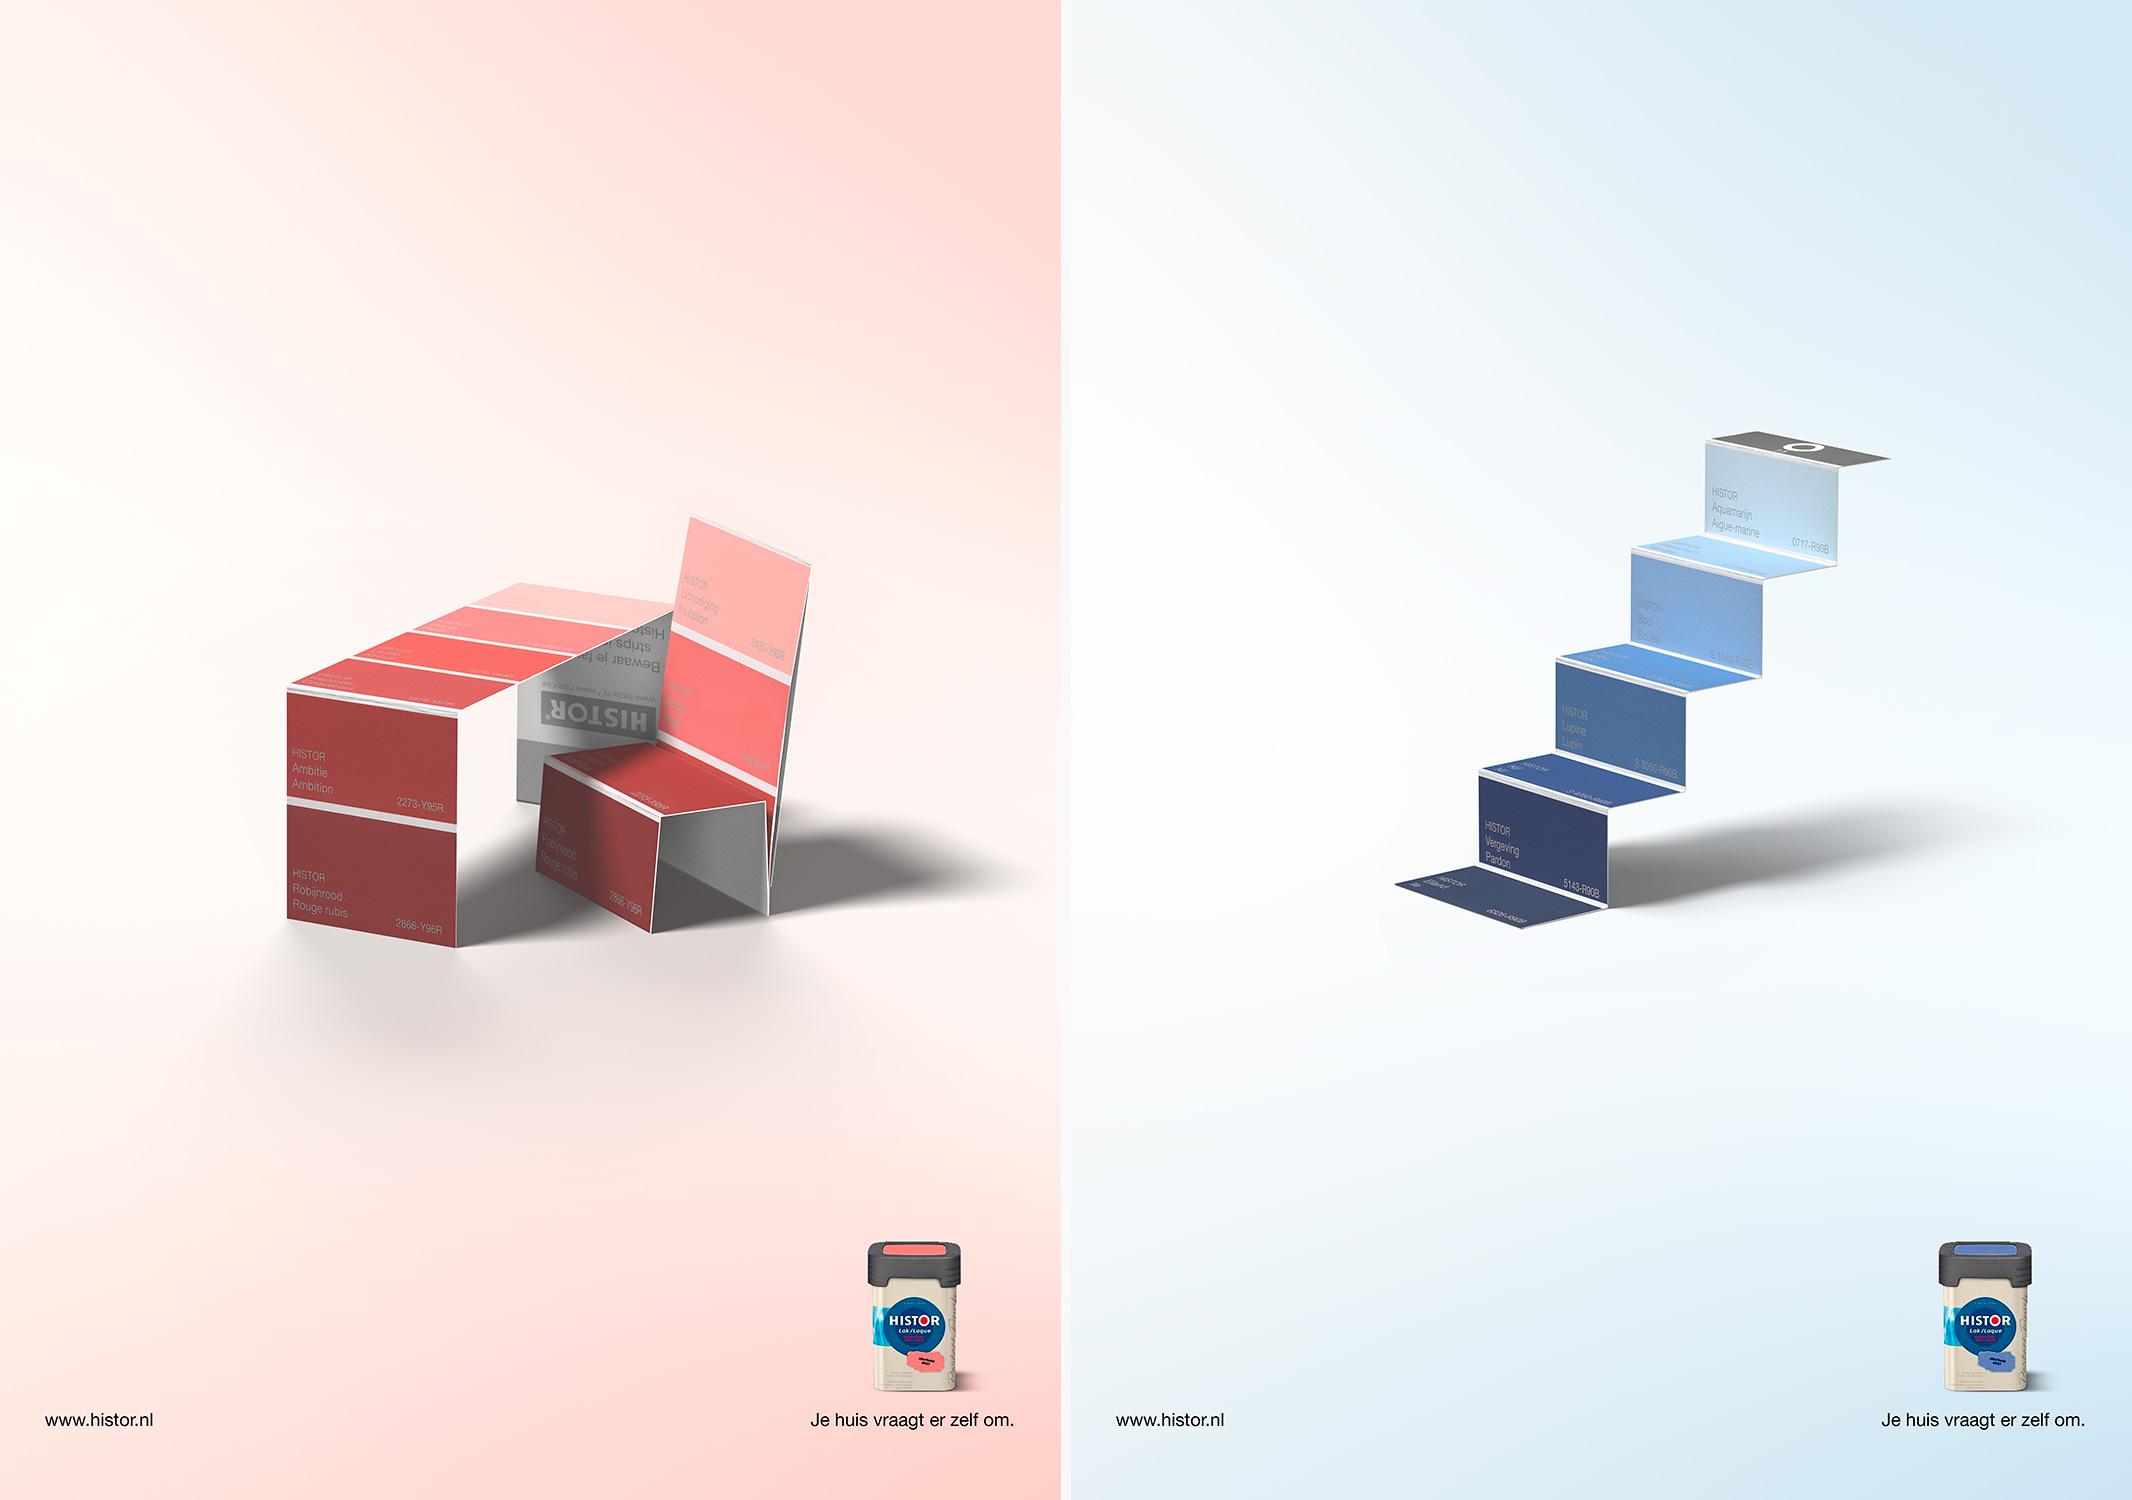 colour; color; sample; card; fold; table; chair; histor; 3d; cgi; amsterdam; the netherlands; kleur; staal; kaart; gevouwen; tafel; stoel; bed